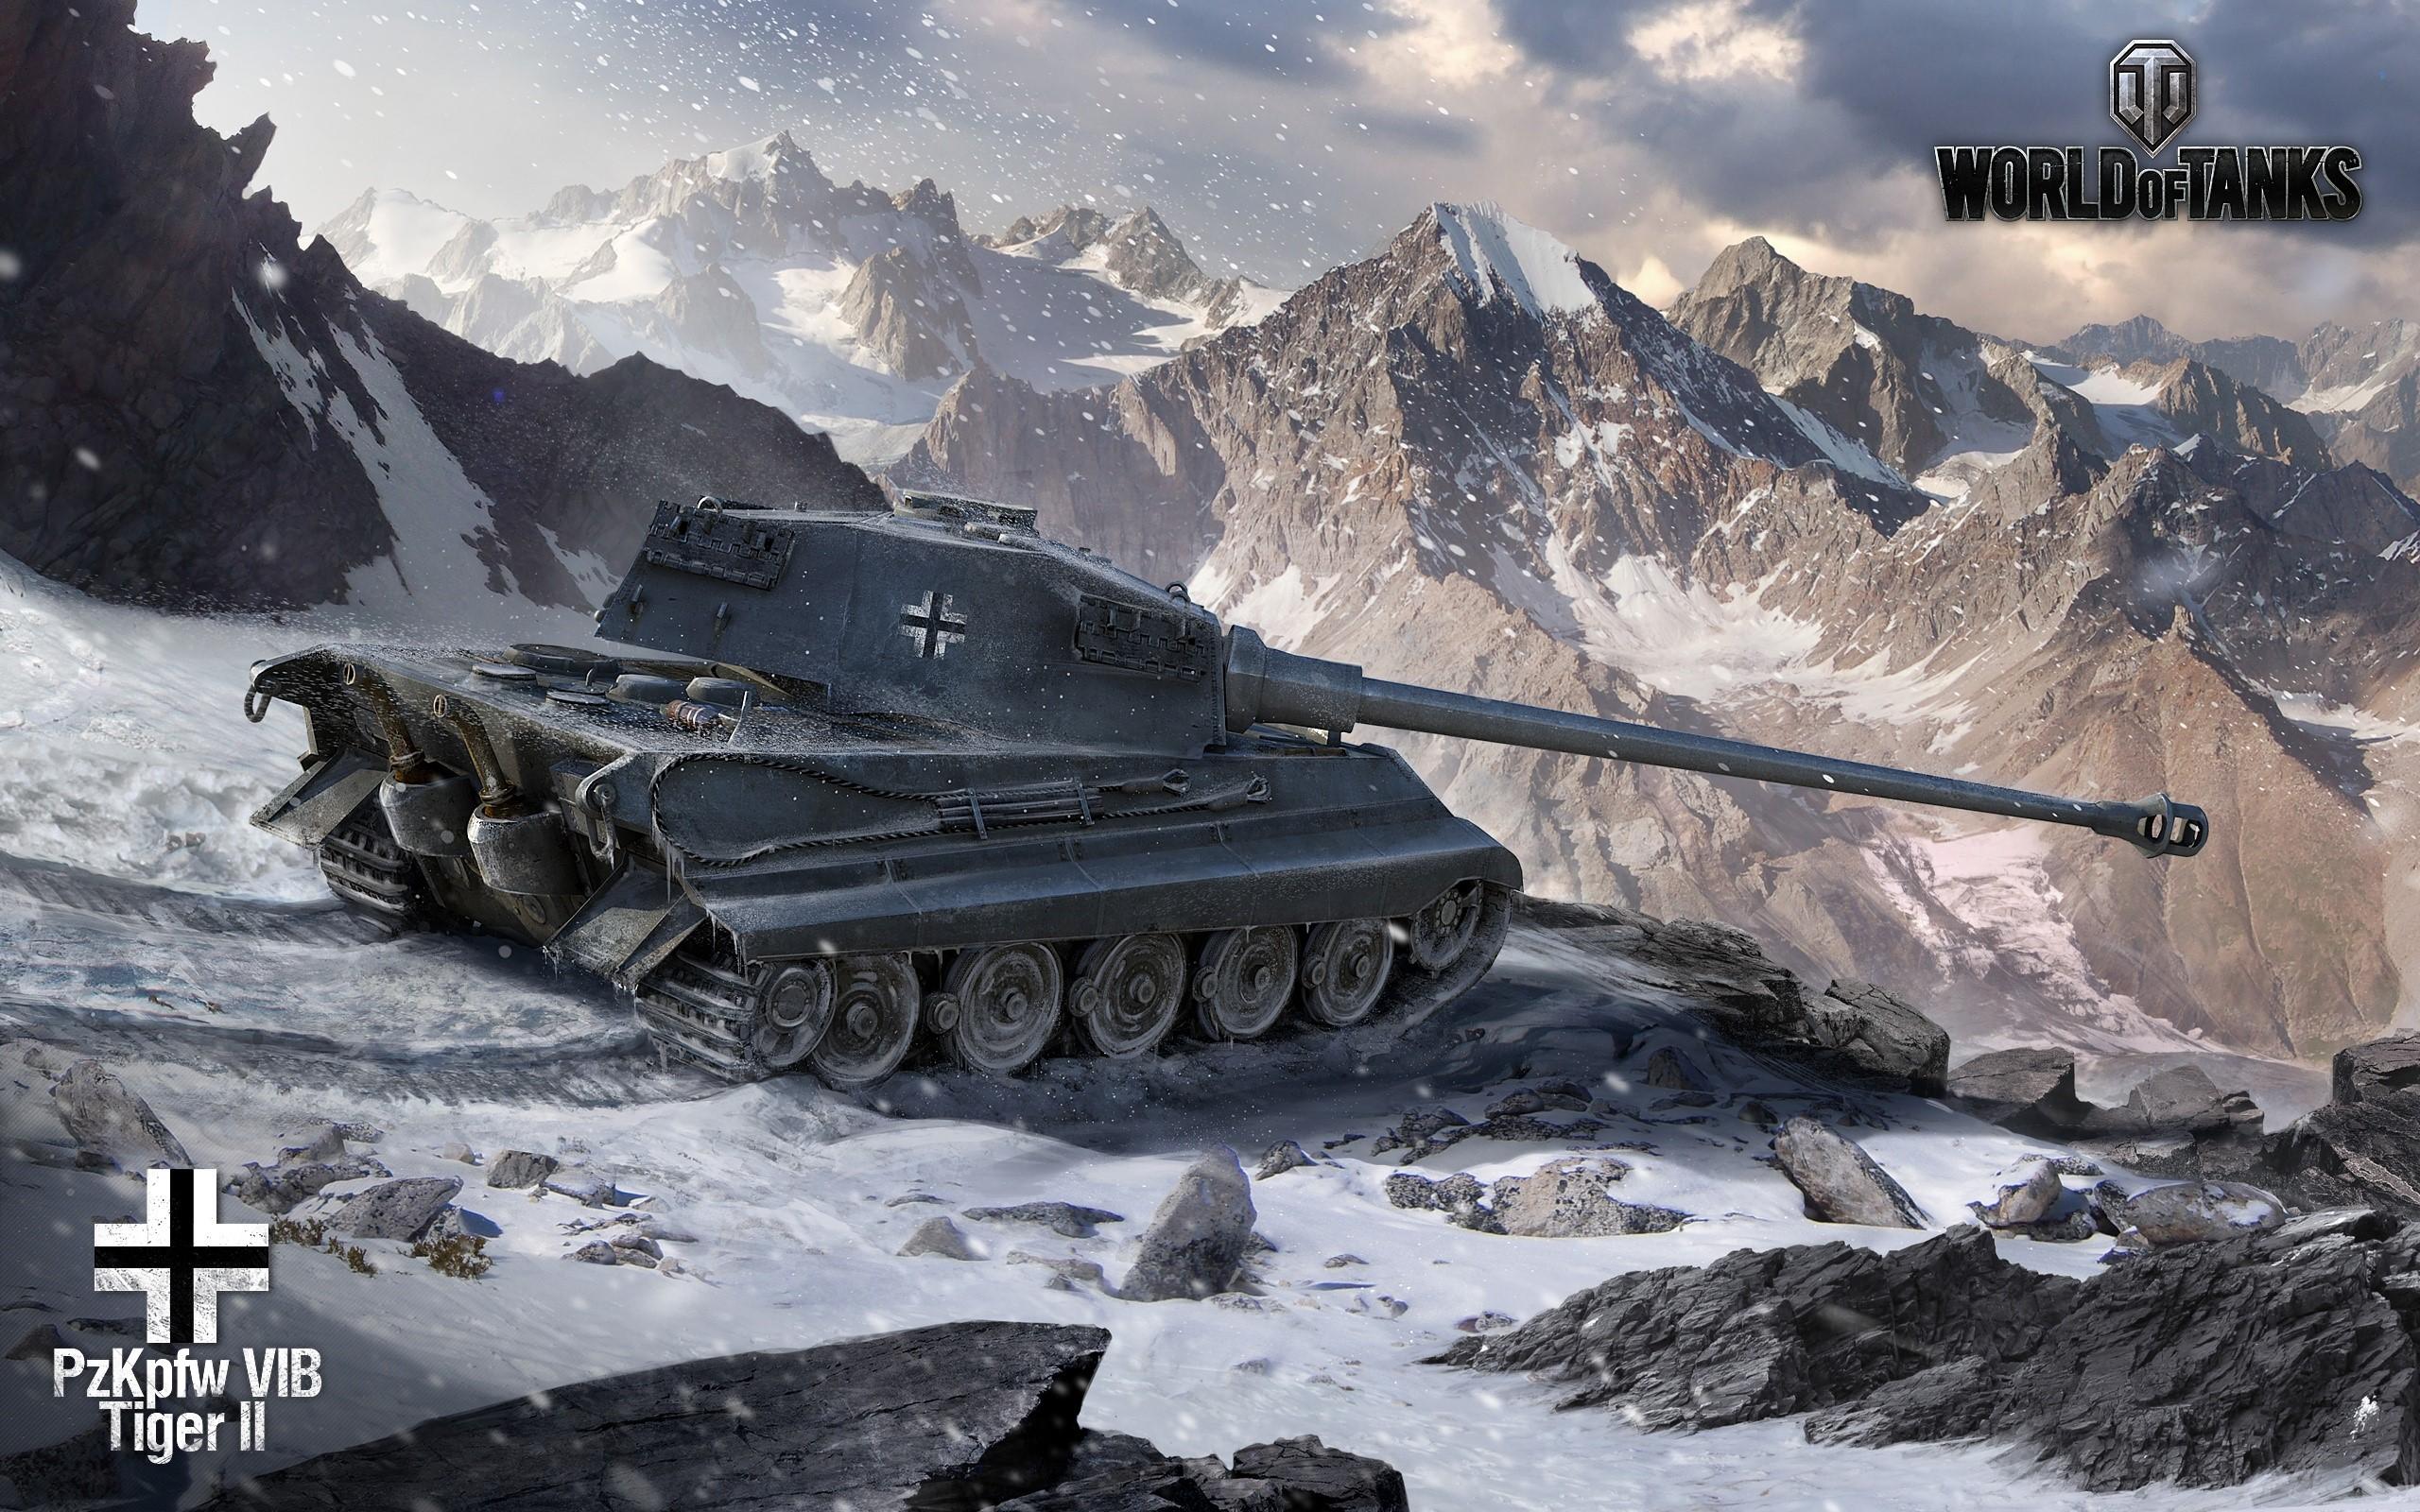 Wallpaper World of tanks king tiger